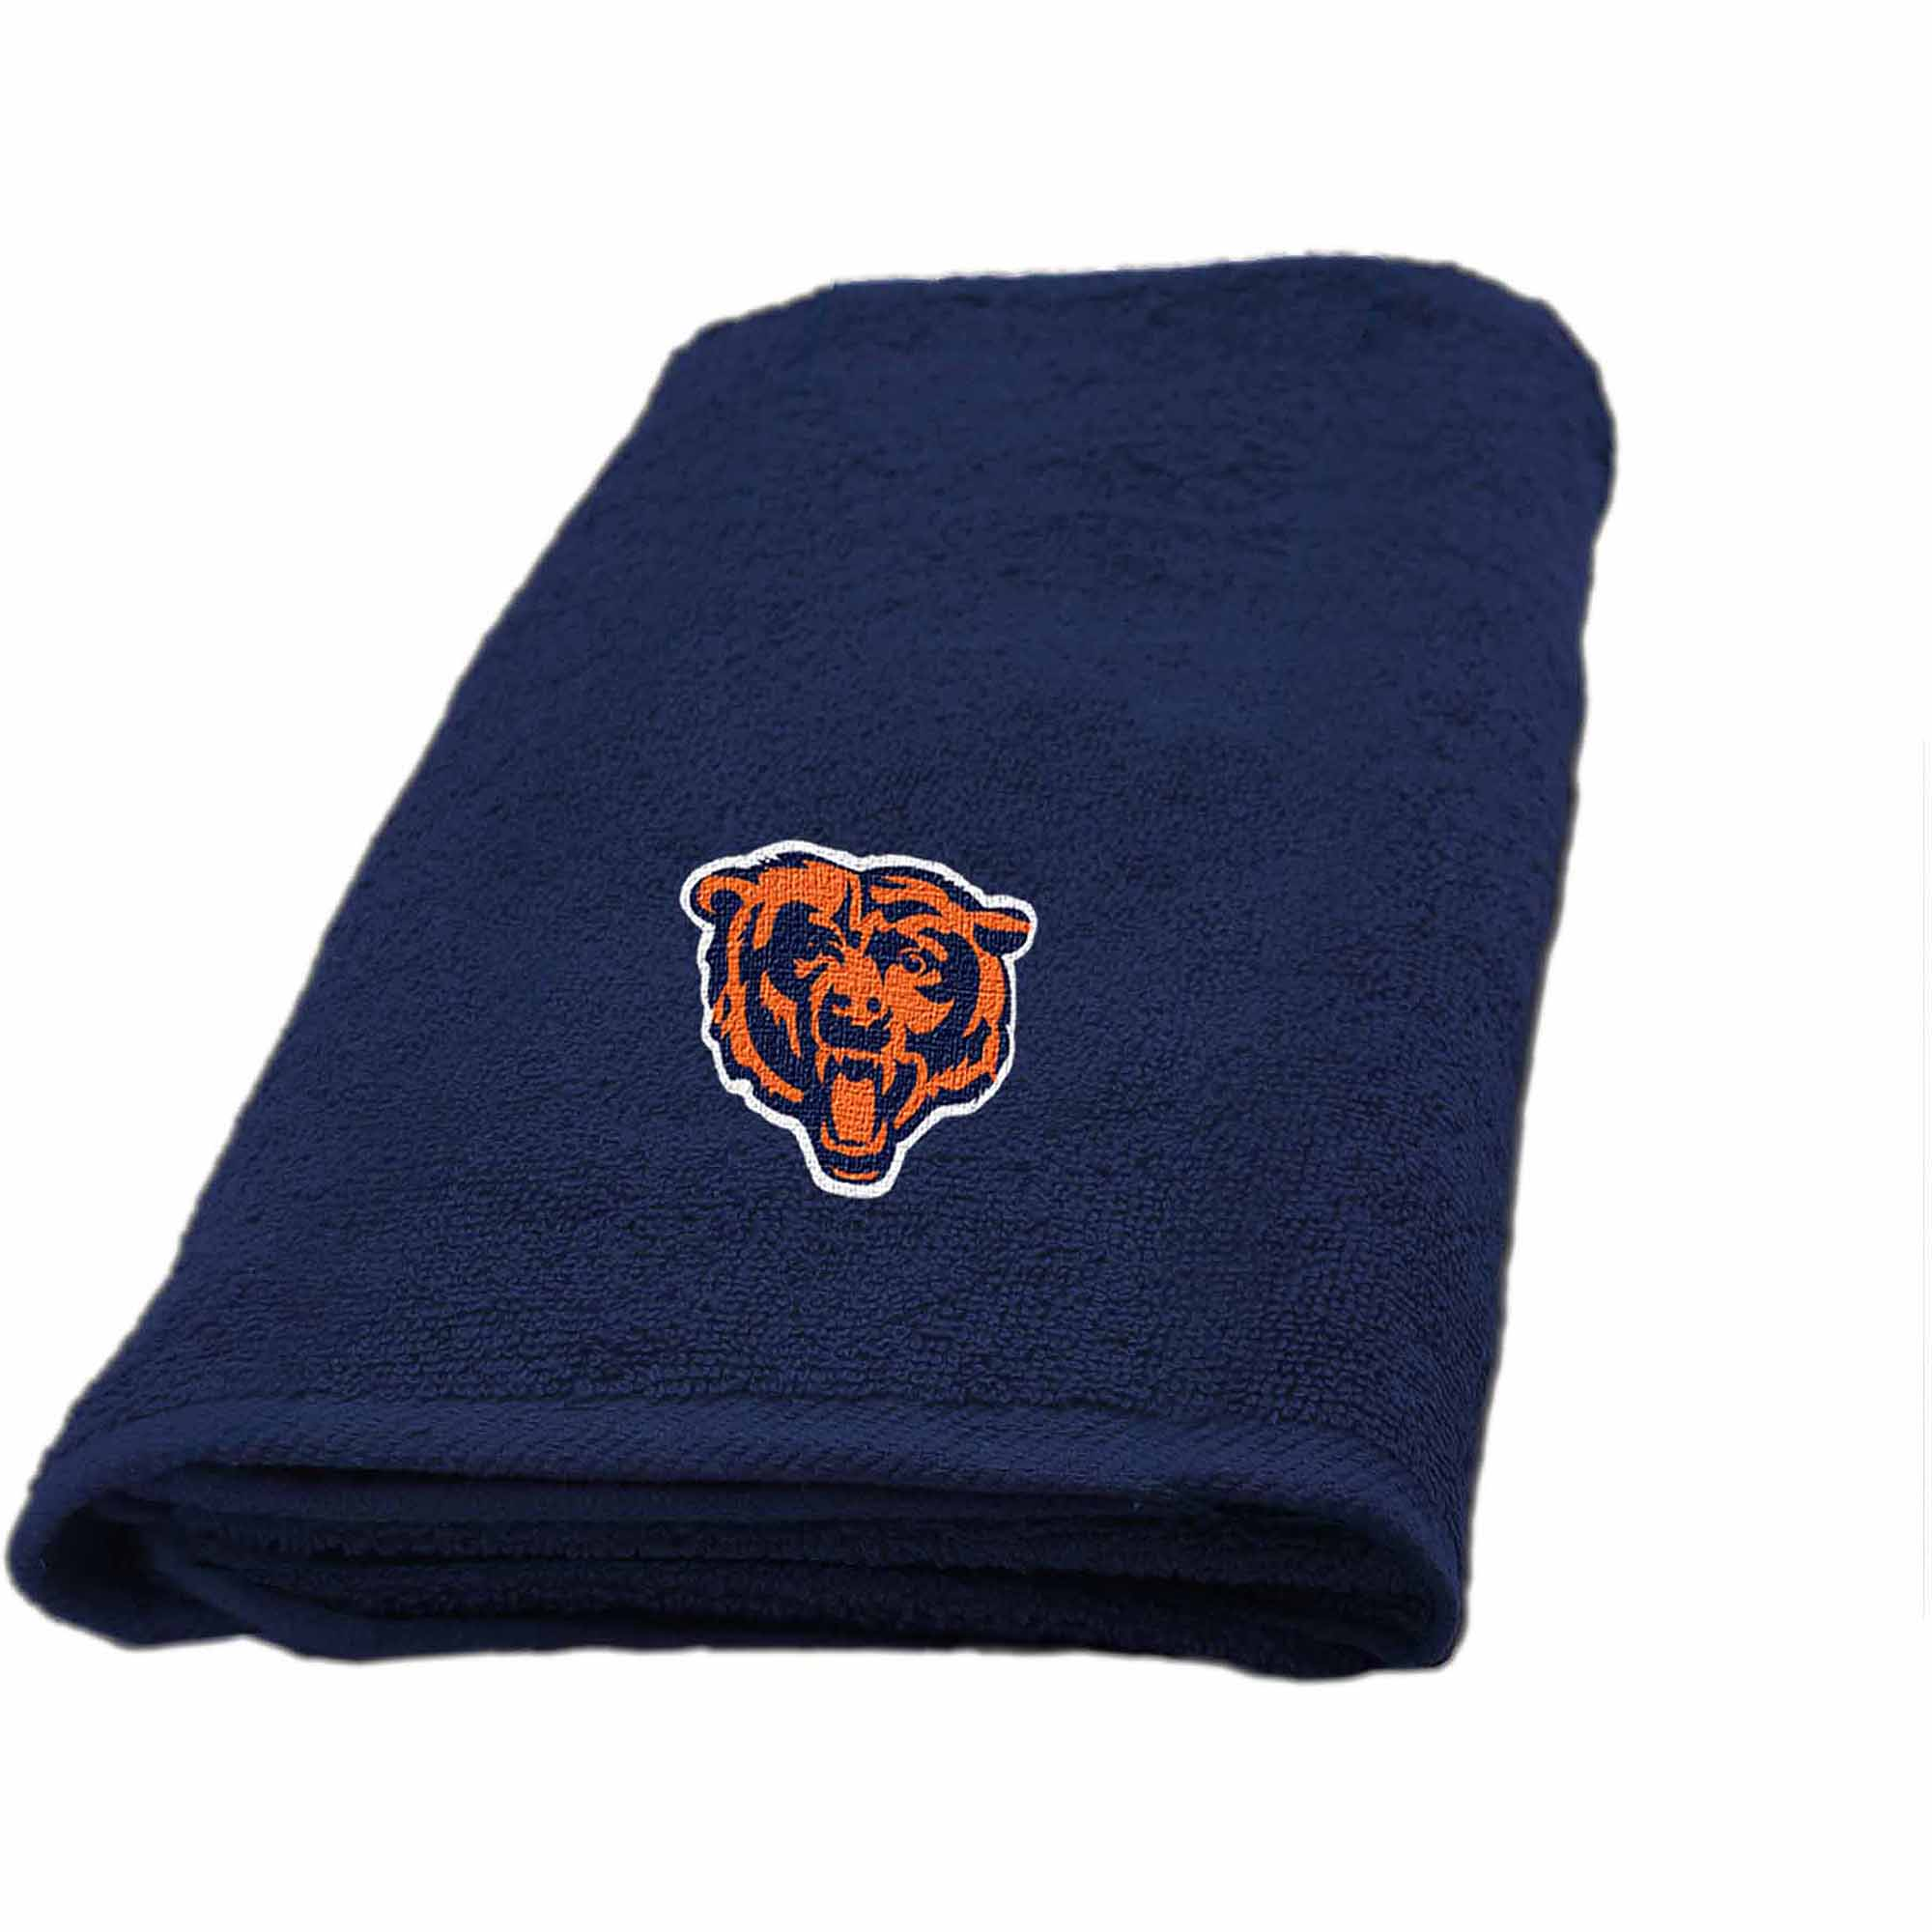 NFL Chicago Bears Hand Towel, 1 Each